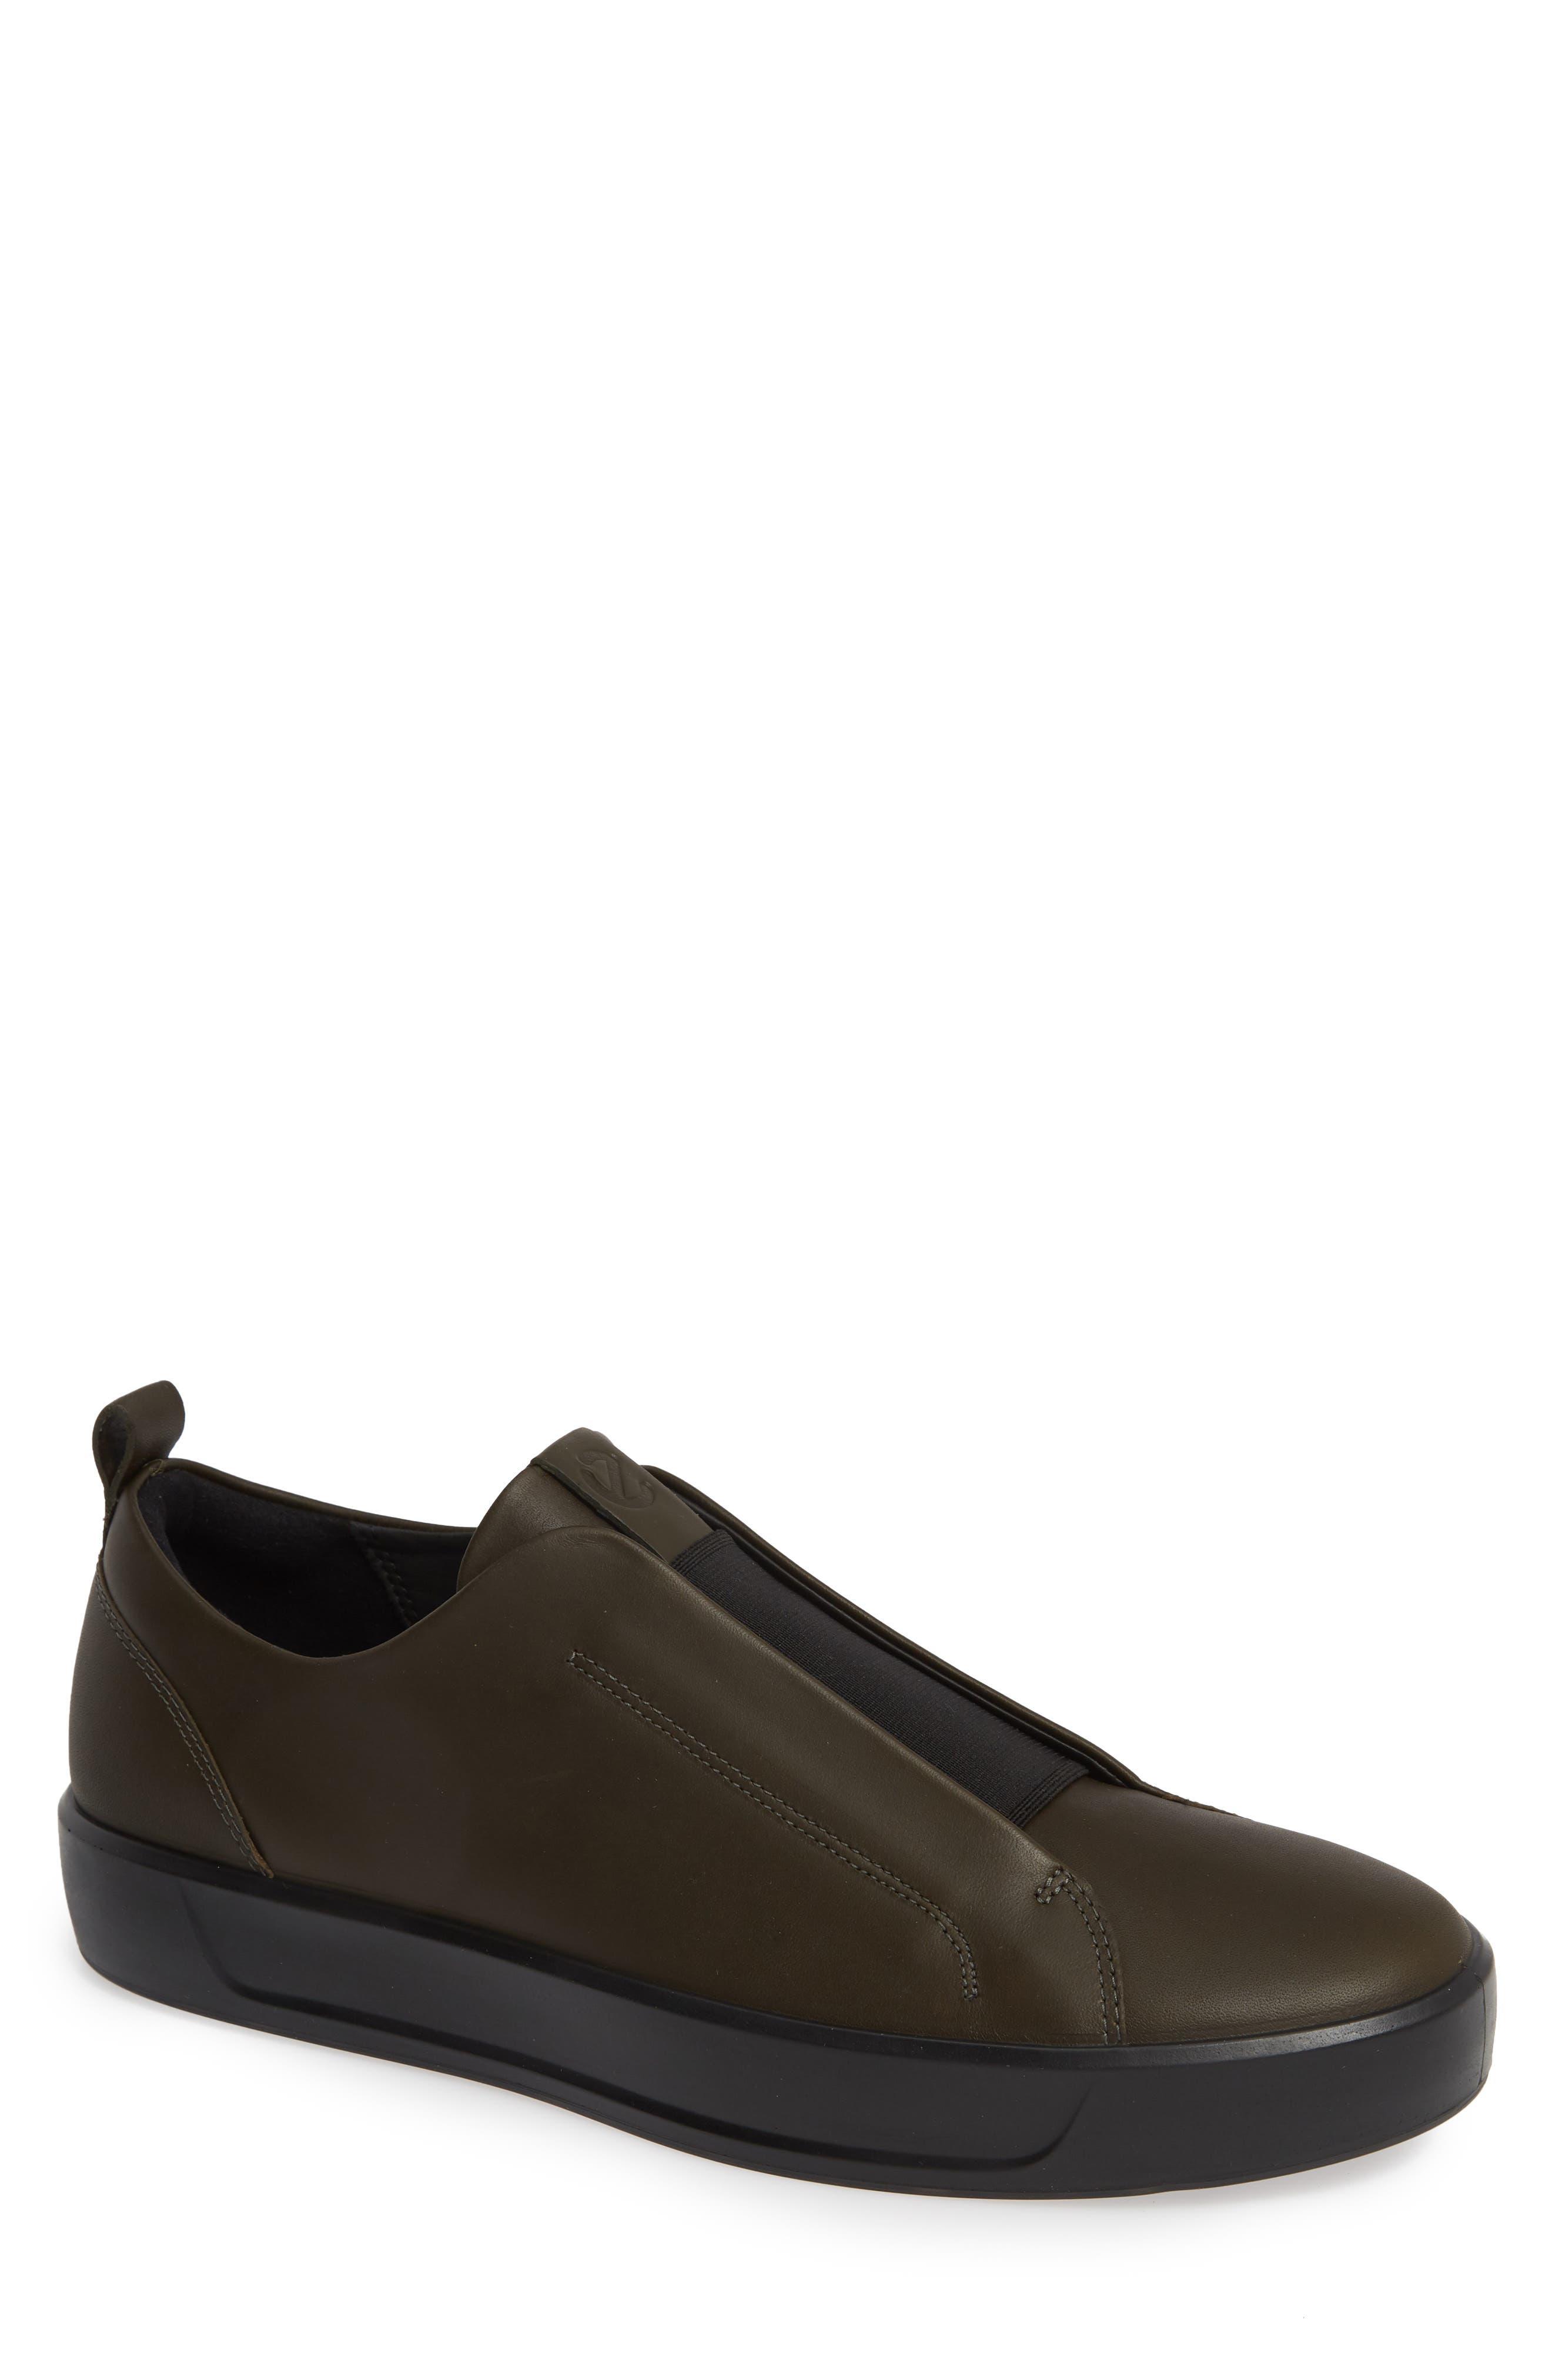 Ecco Soft 8 Slip-On Sneaker - Green